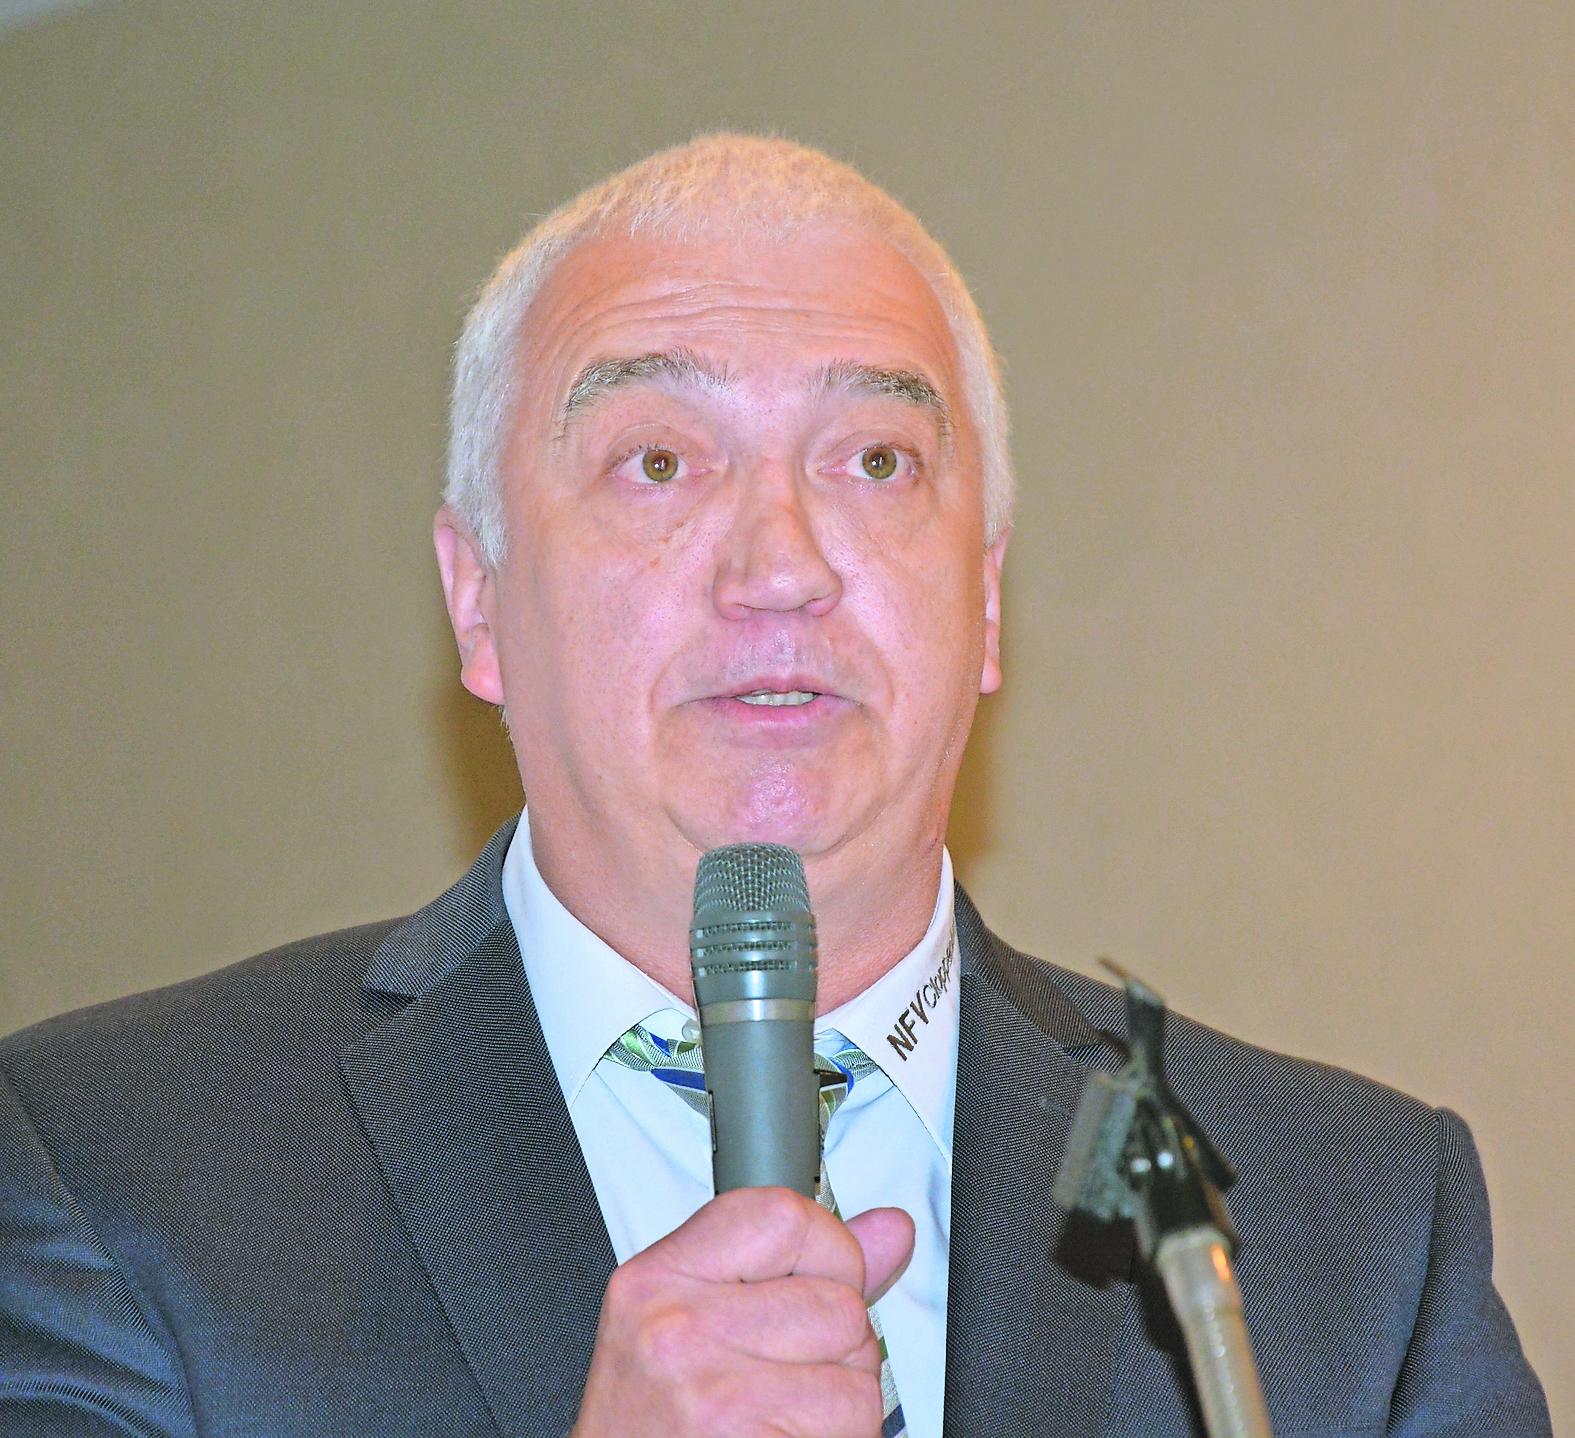 Manfred Südbeck. Foto: Wulfers